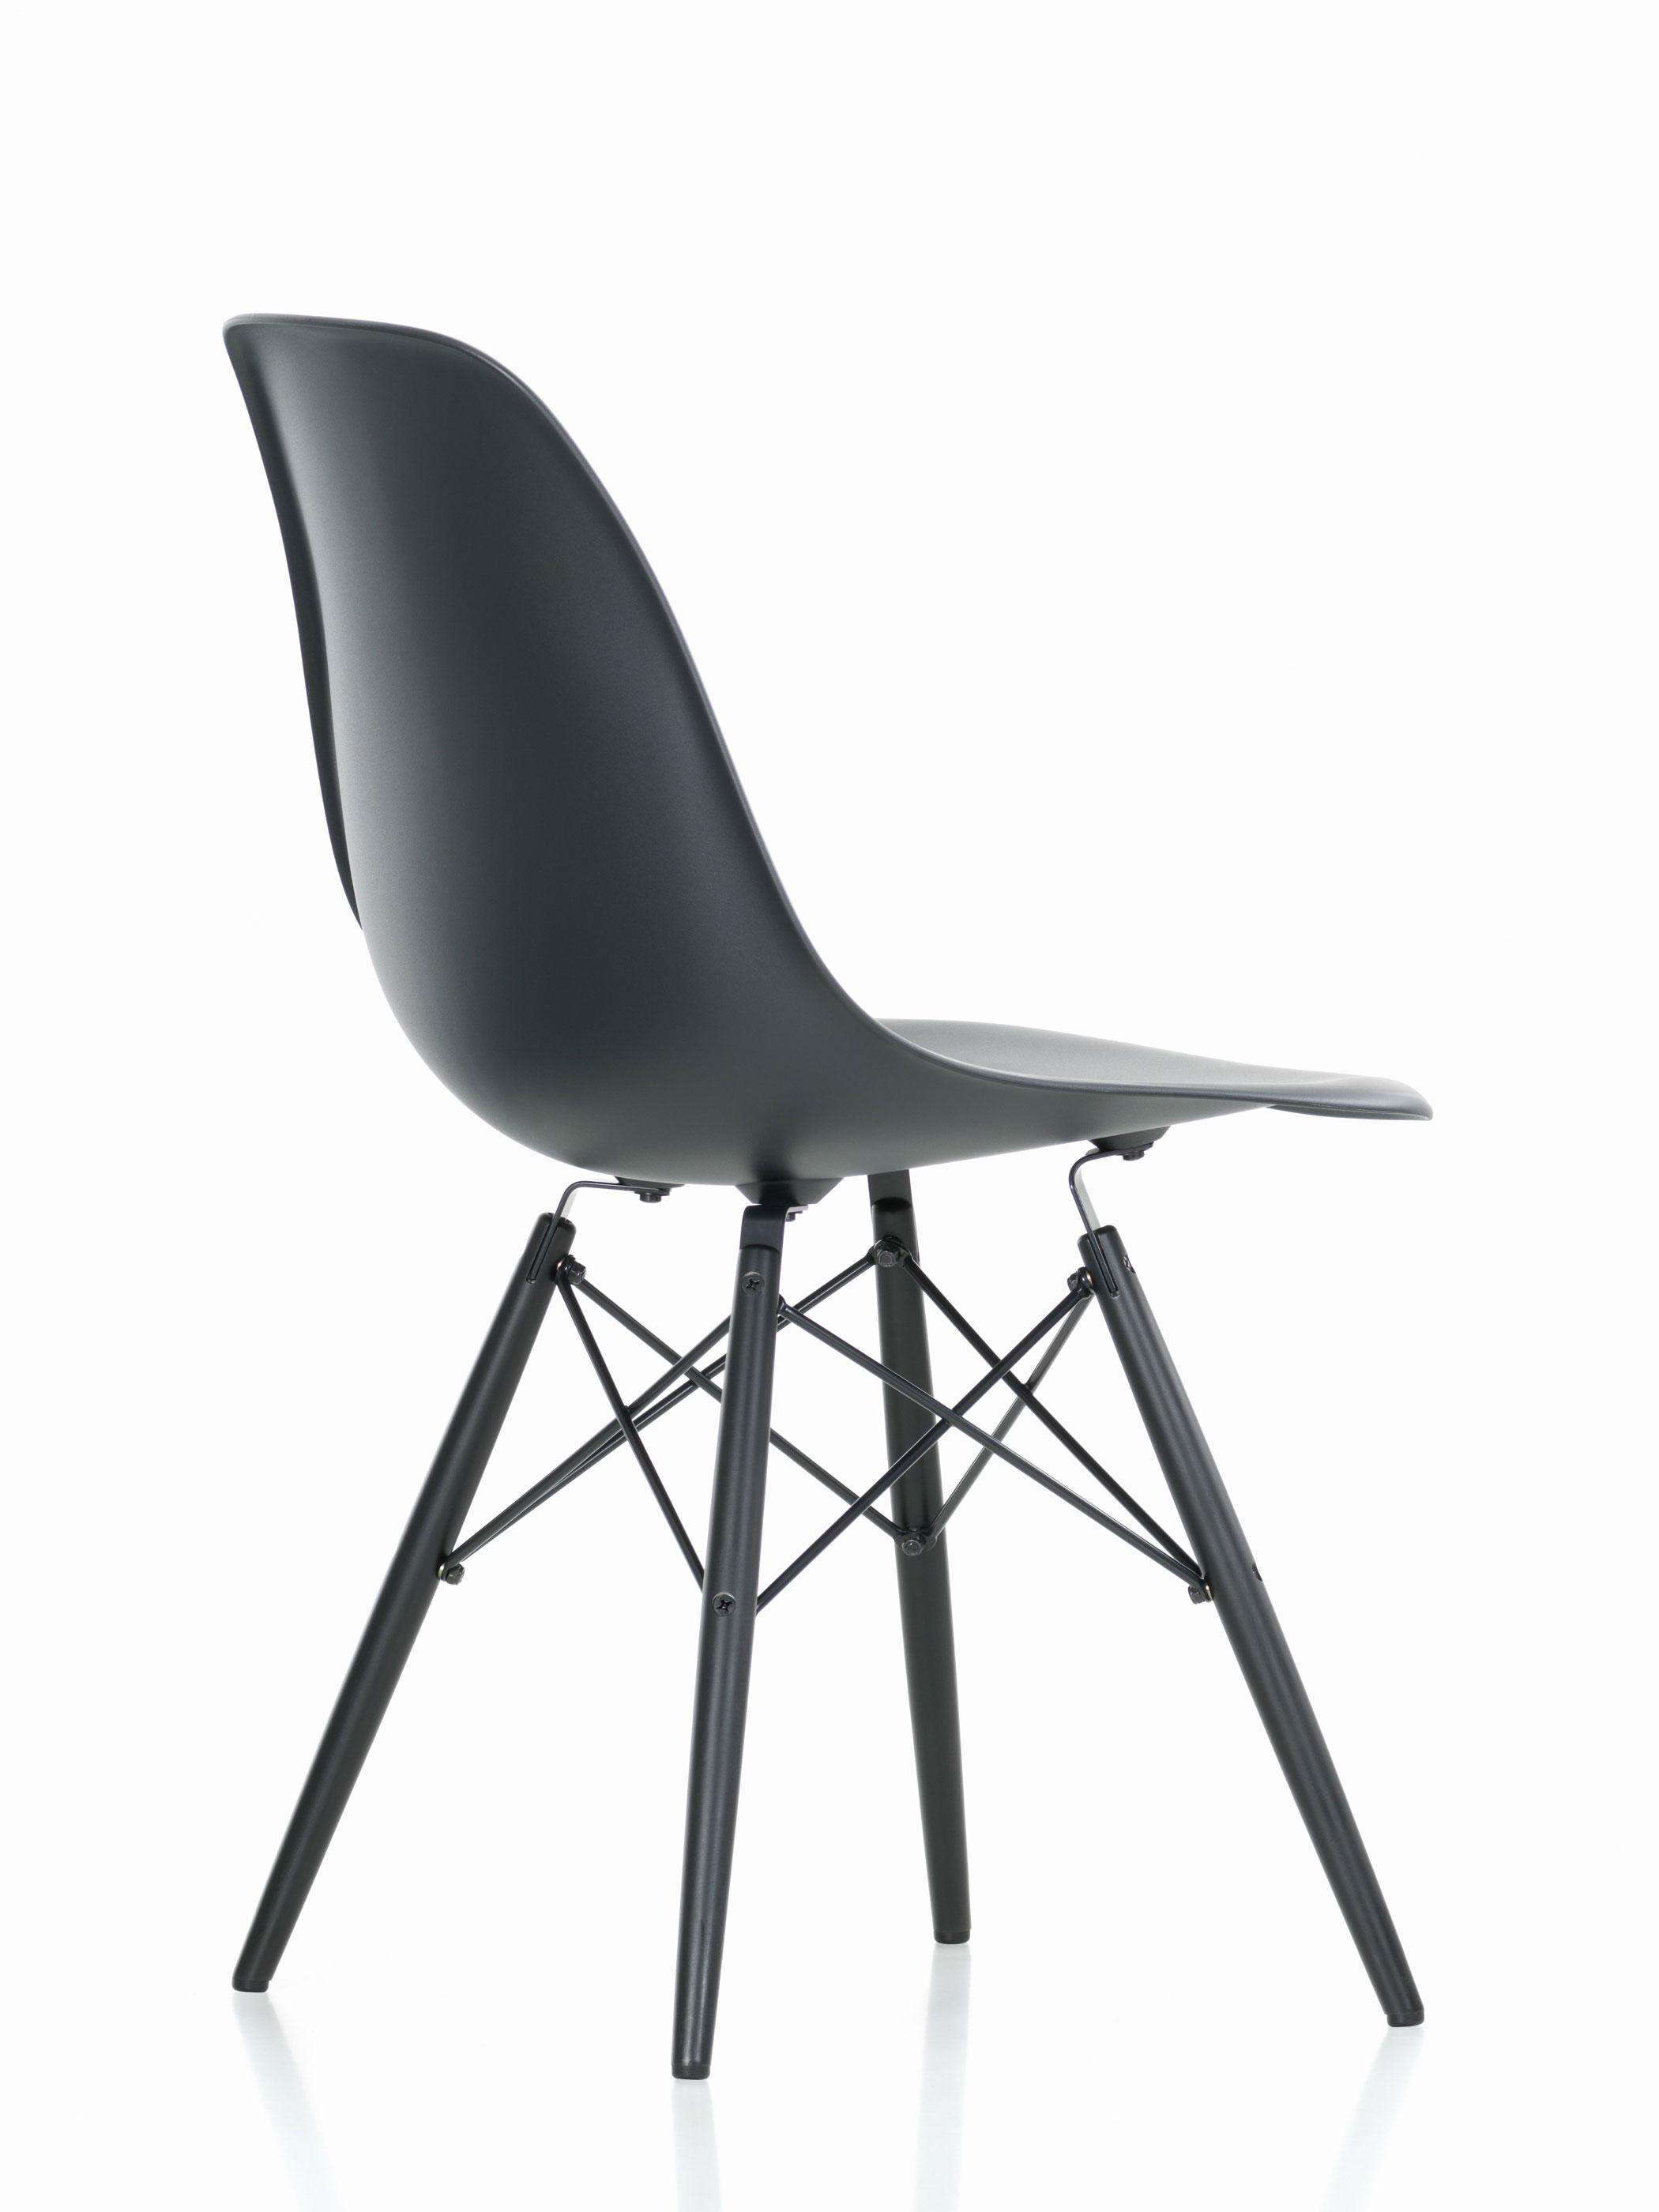 vitra eames plastic side chair dsw 440 023 30 produktdetails. Black Bedroom Furniture Sets. Home Design Ideas